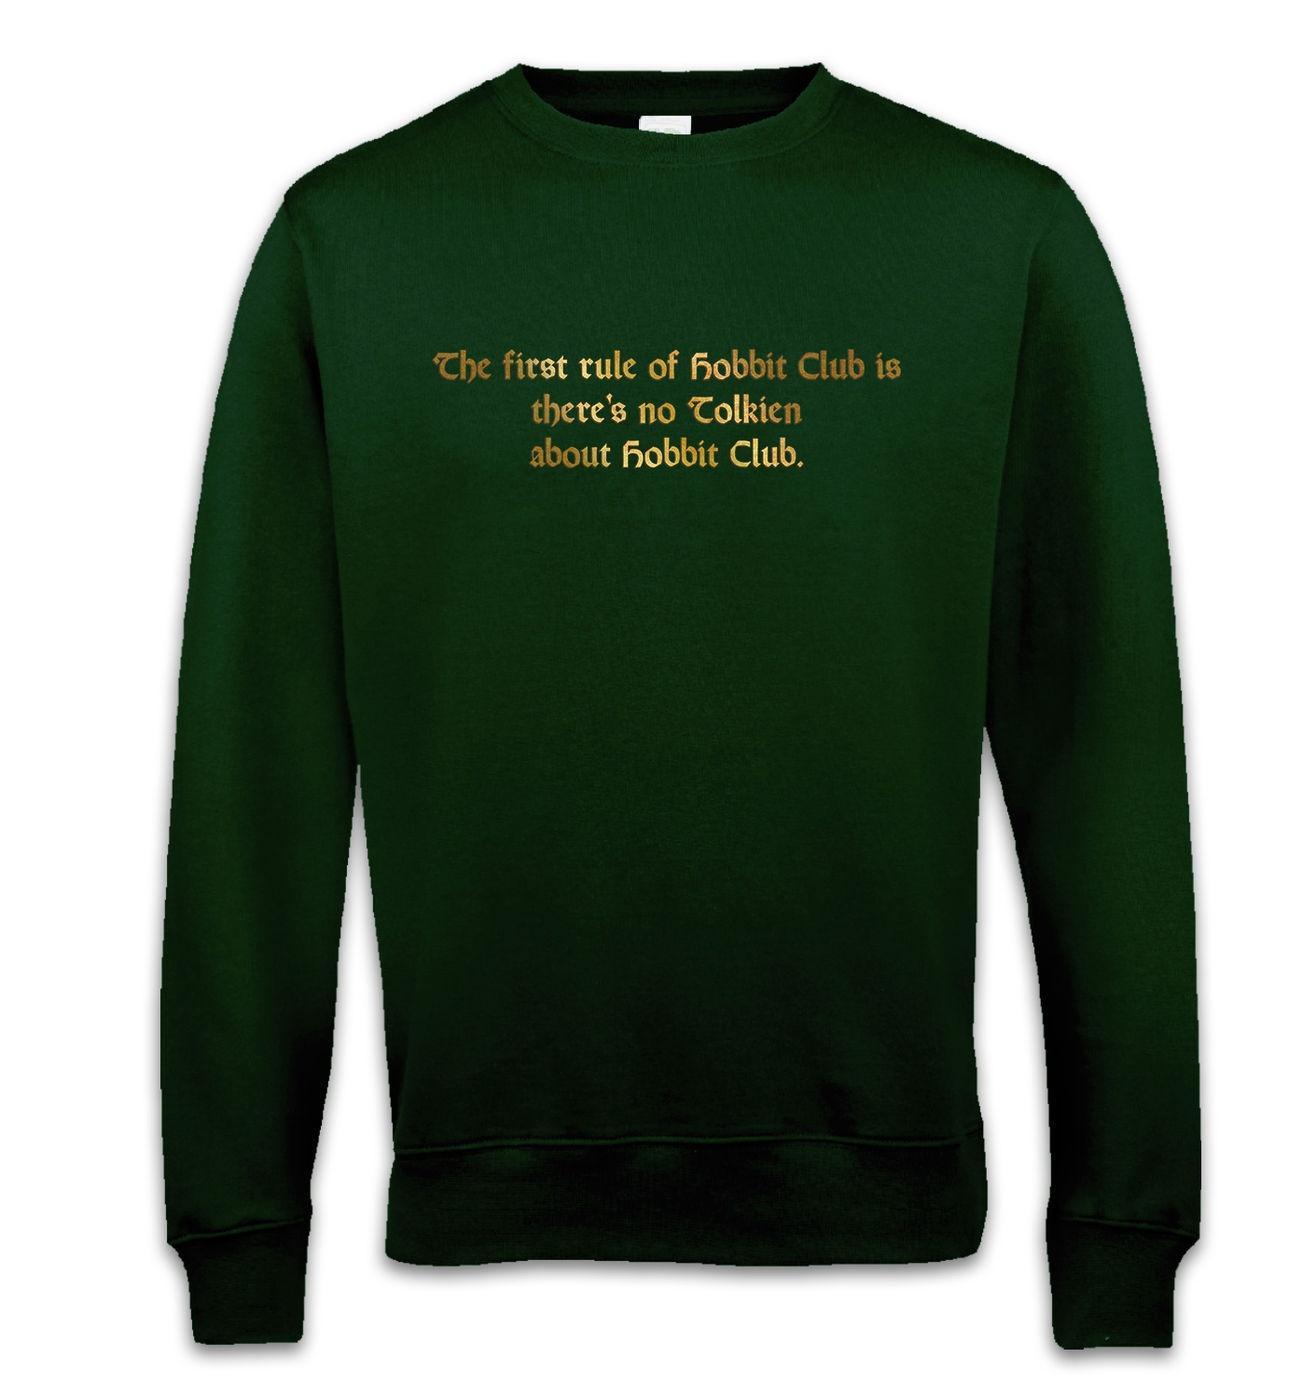 Hobbit Club sweatshirt - funny The Hobbit / Fight Club mashup sweater